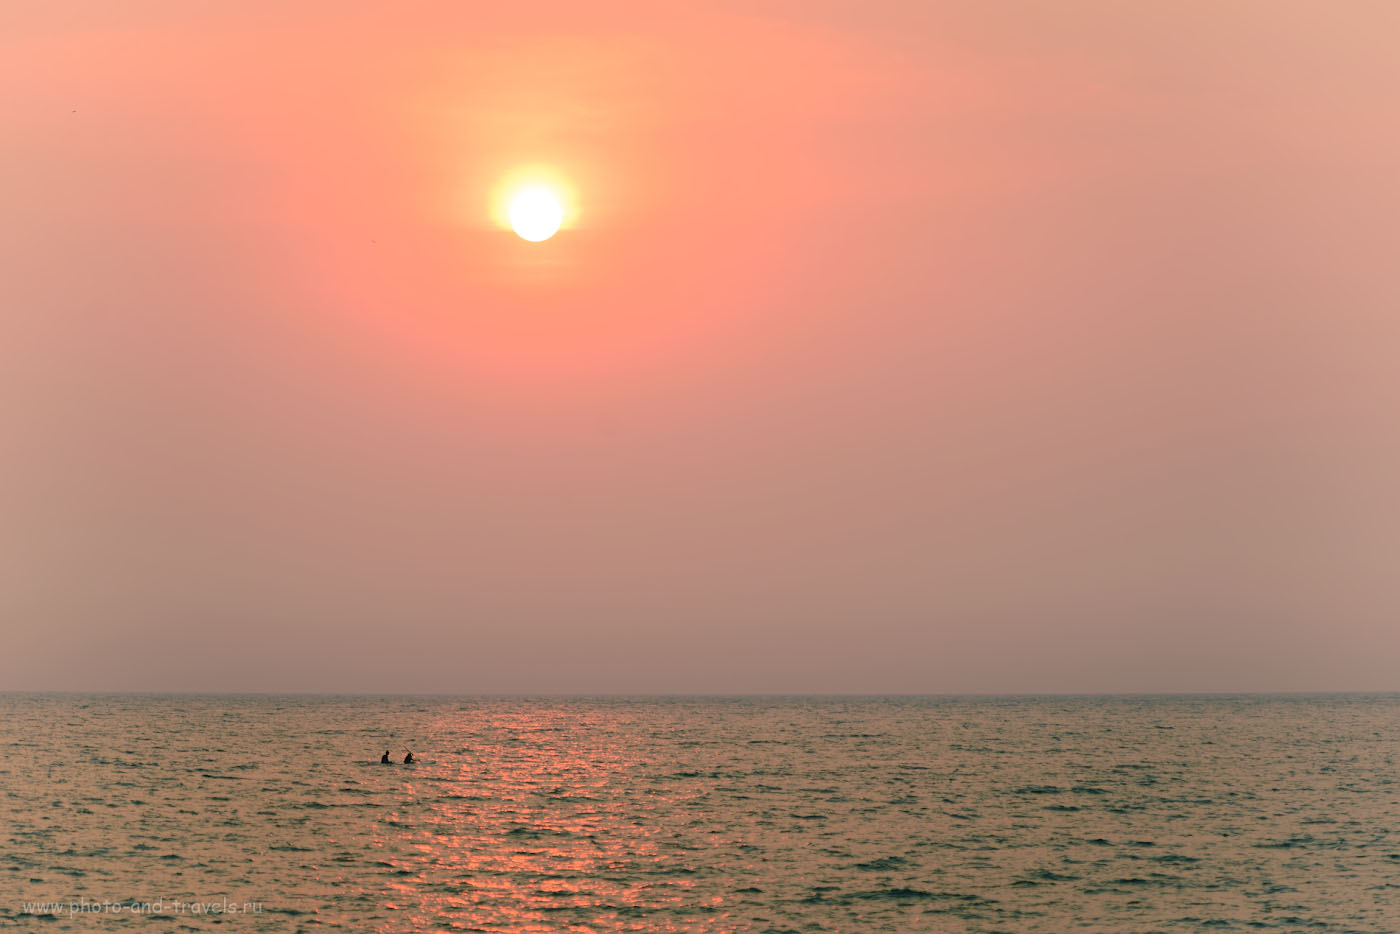 Фото 5. Закат над Аравийским морем. Отзыв об отдыхе в Индии. 1/400, -0.33, 4.0, 100, 135.